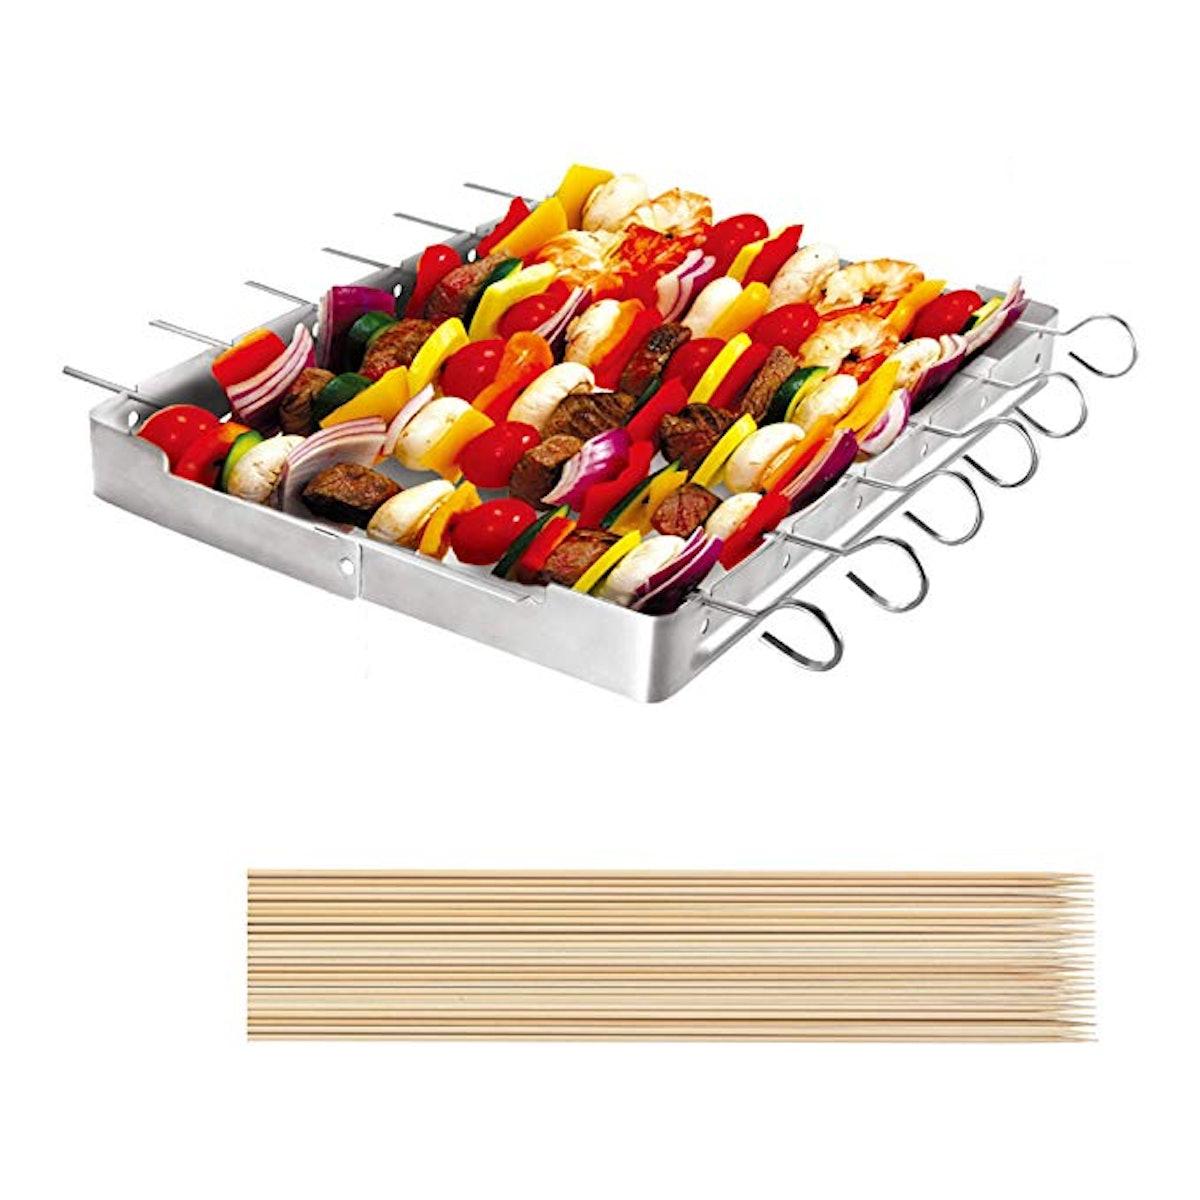 Unicook Stainless Steel Barbecue Skewer